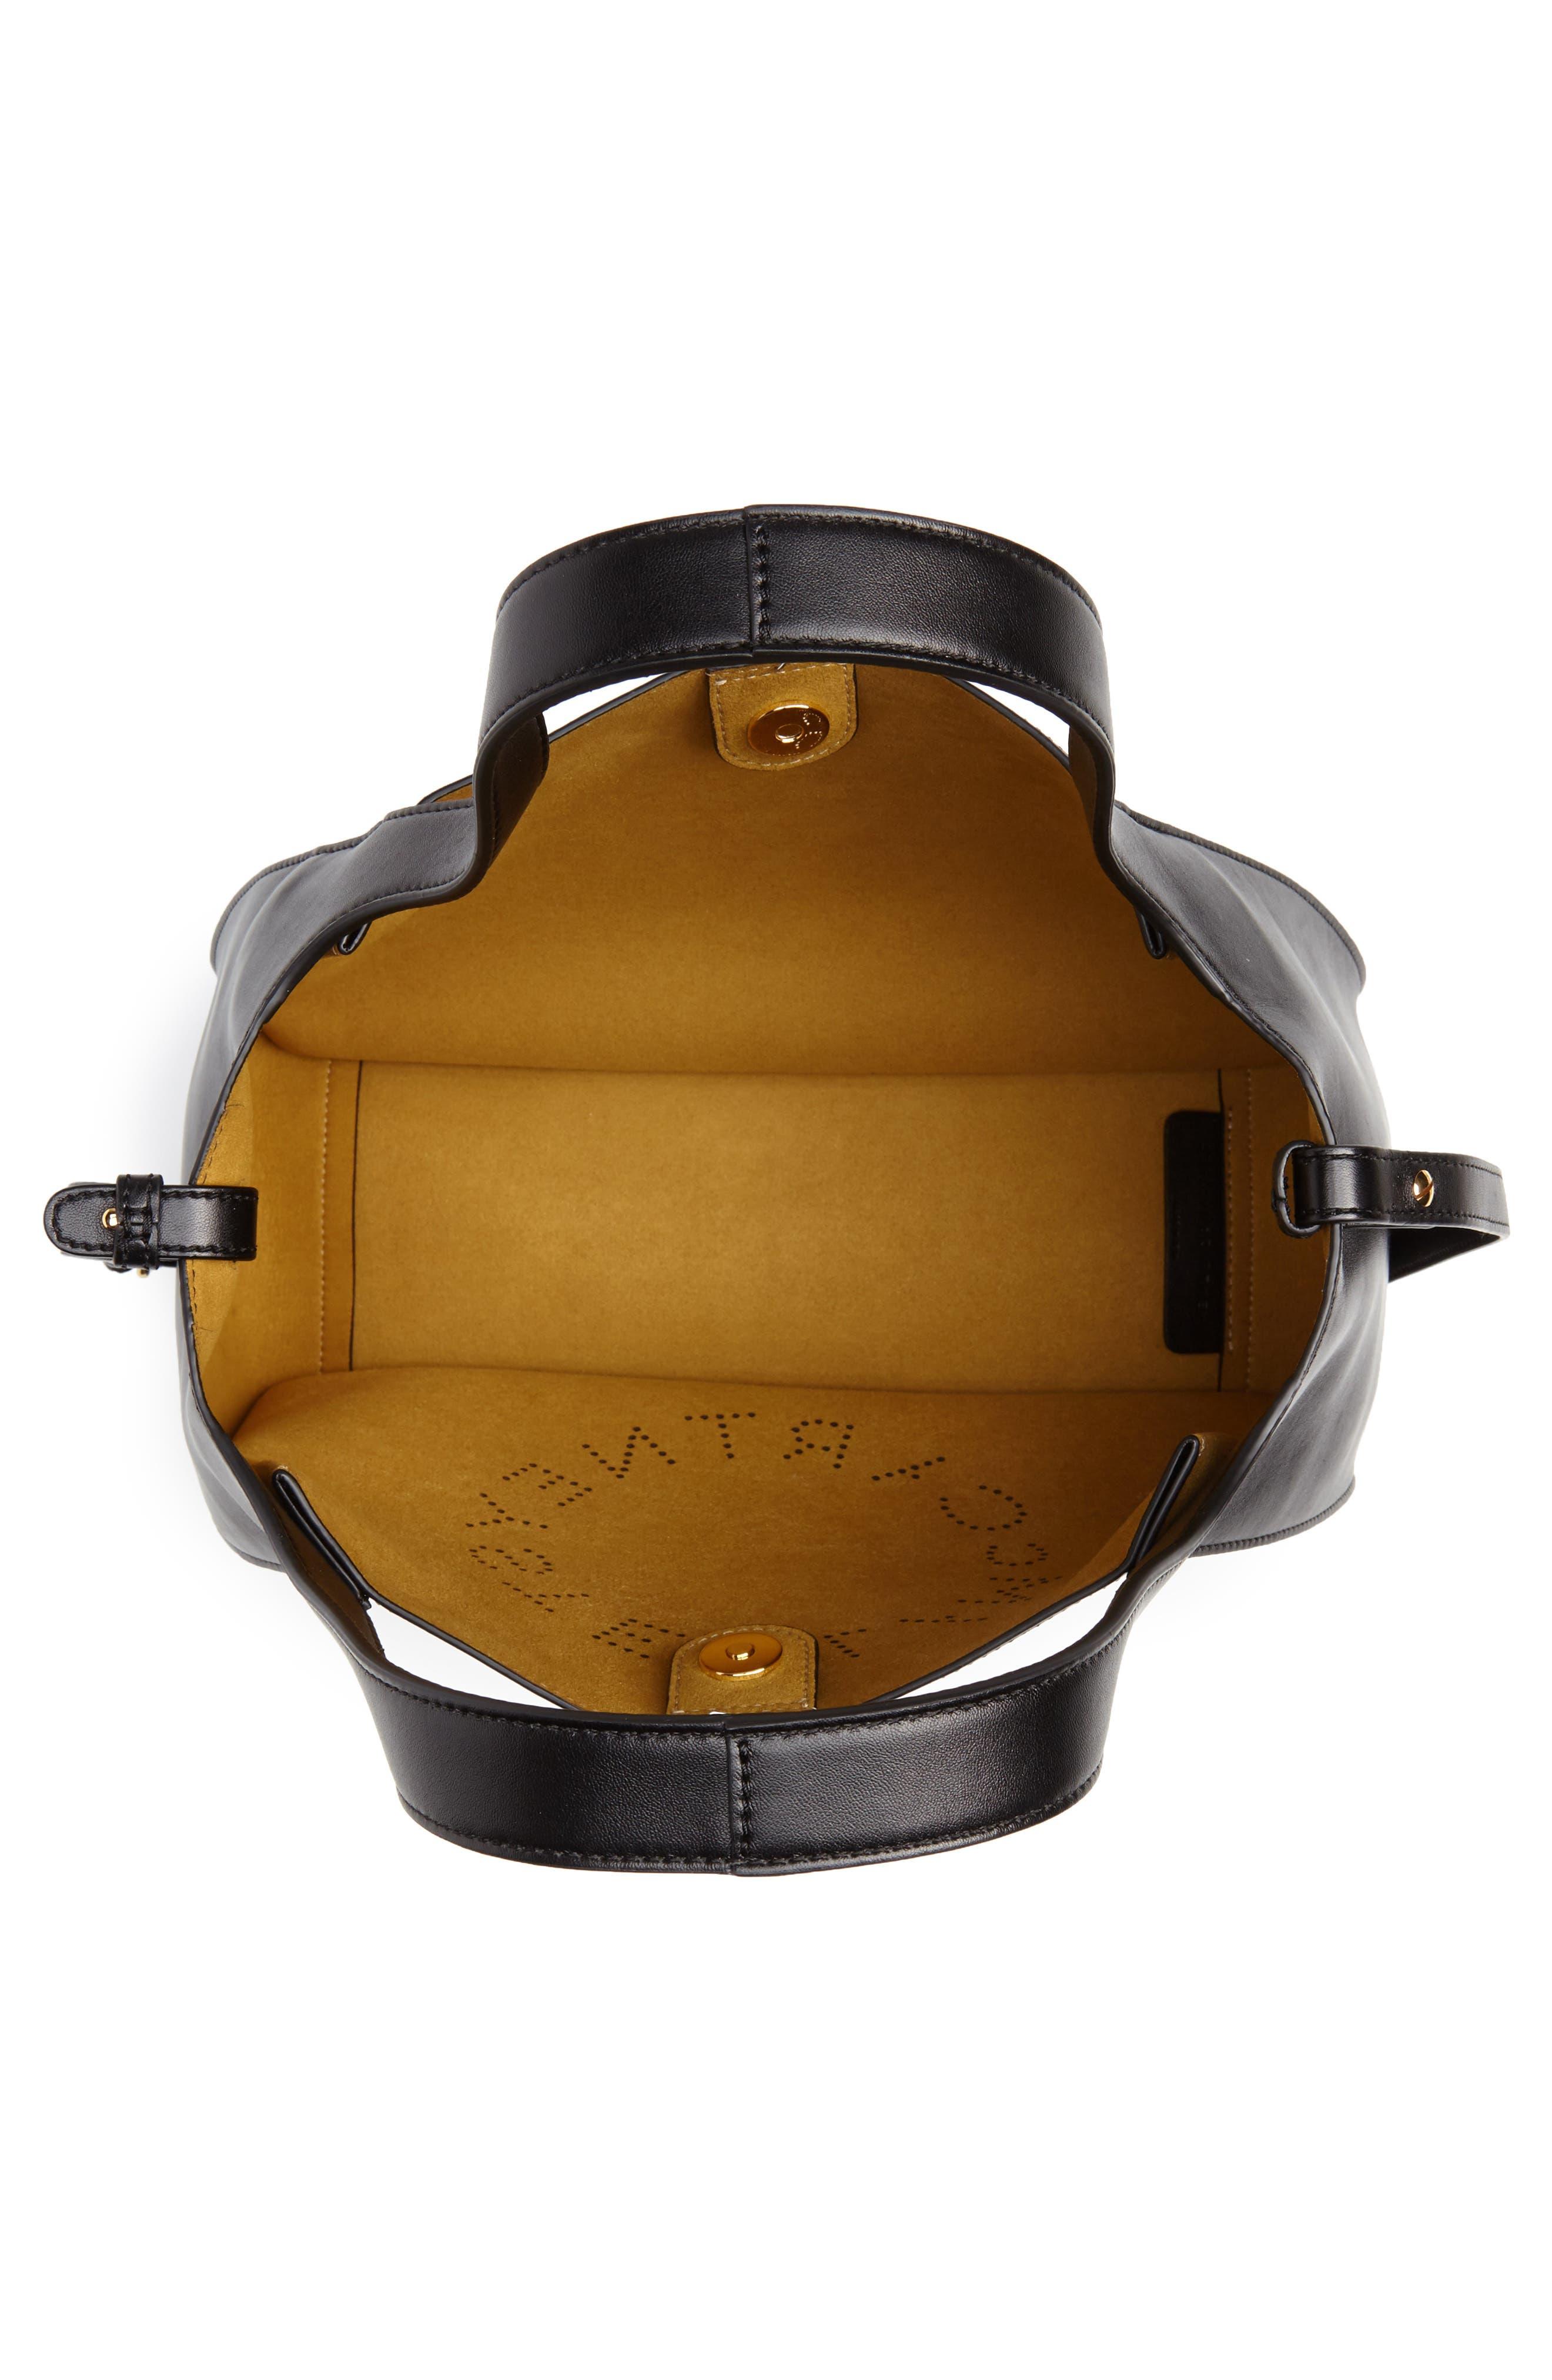 STELLA MCCARTNEY, Perforated Logo Faux Leather Satchel, Alternate thumbnail 4, color, BLACK